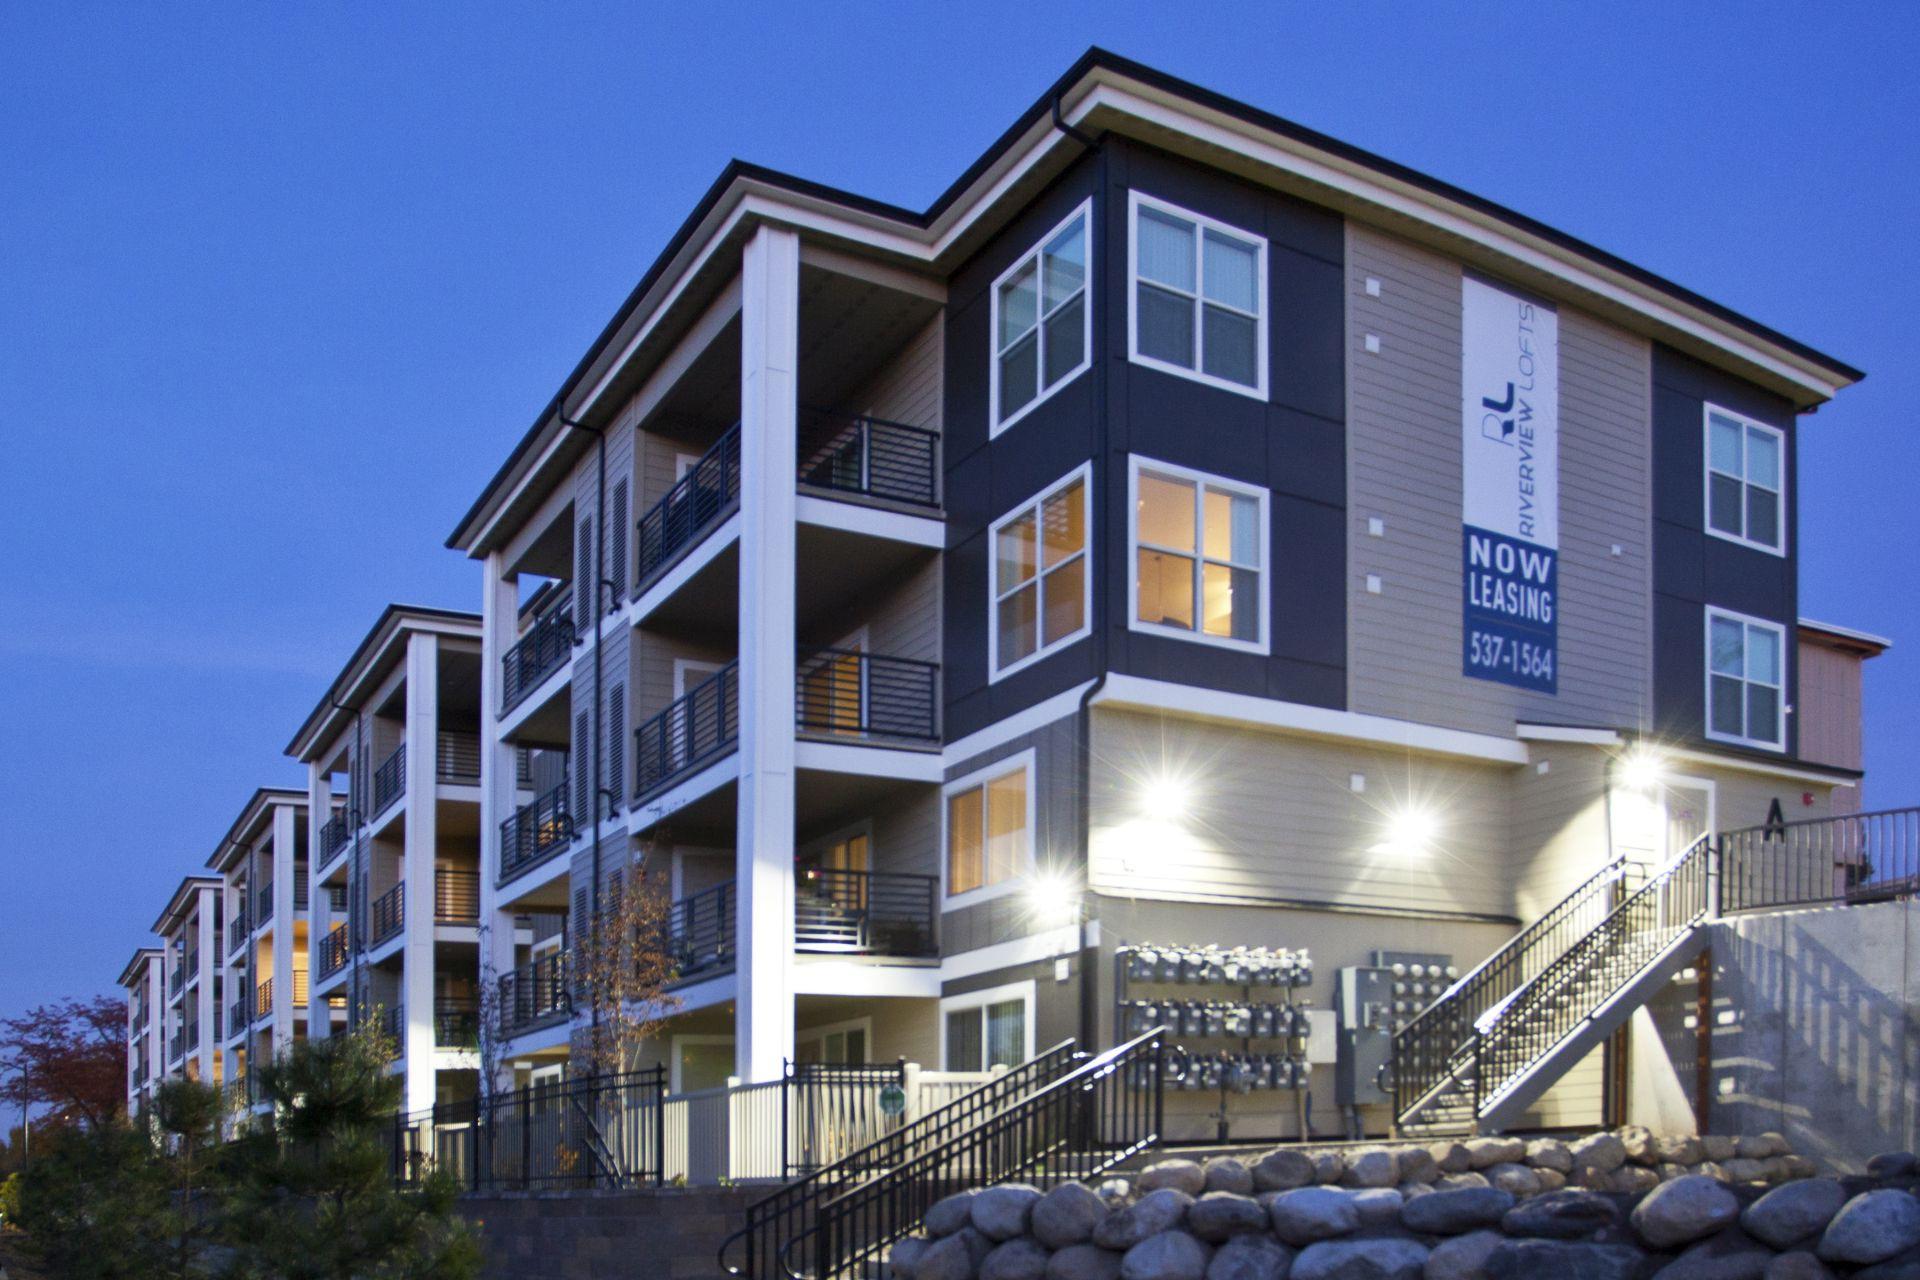 Apartments Near Gonzaga Riverview Lofts for Gonzaga University Students in Spokane, WA